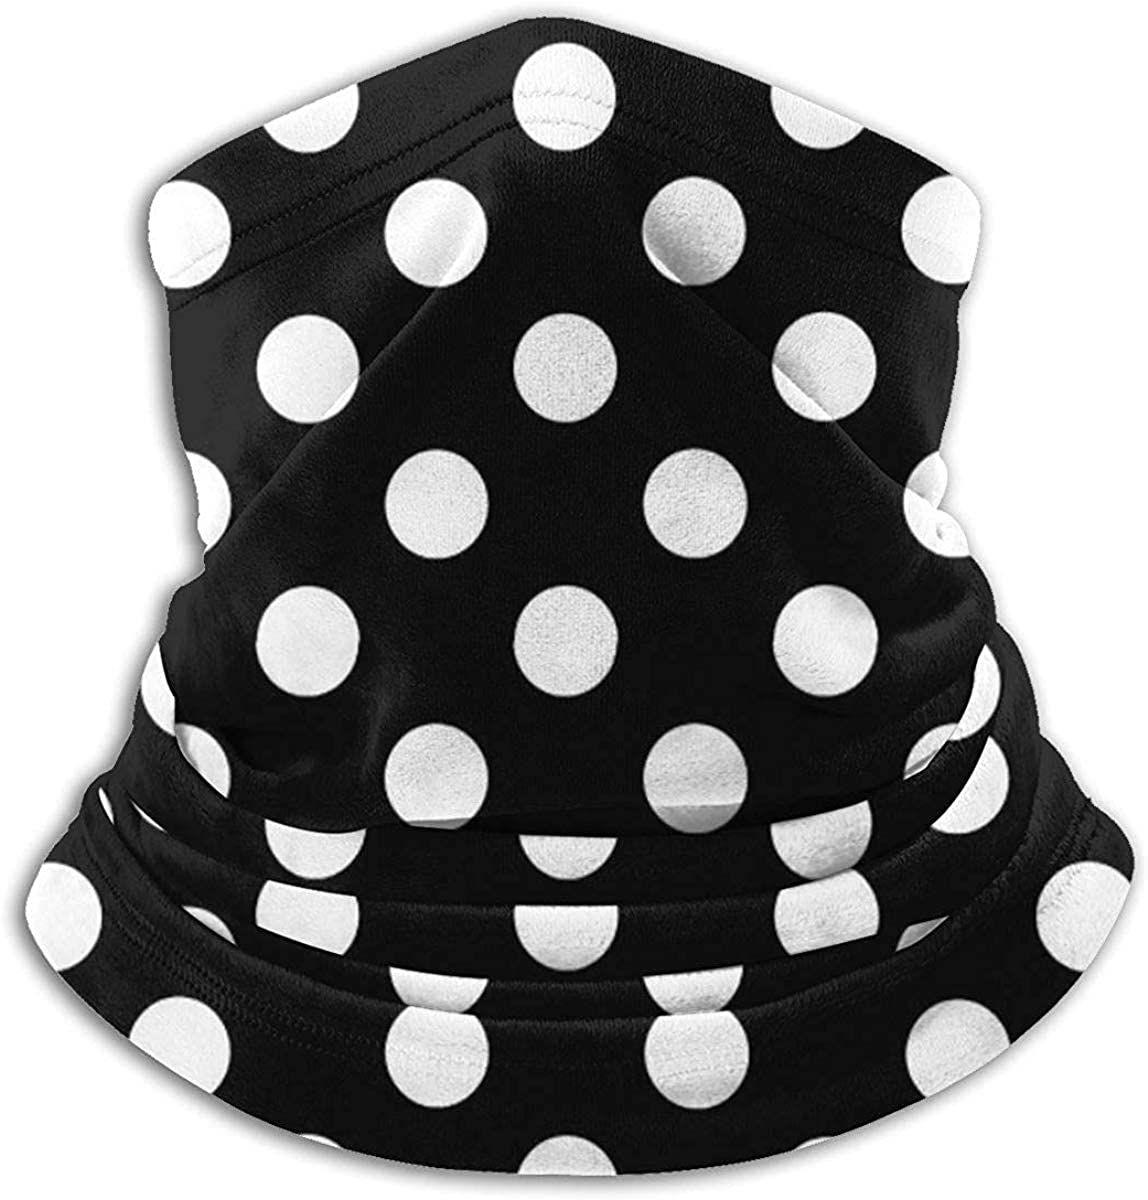 Hip-Hop Music R/&B Novelty Funny Cool Men Women Unisex Top Hoodie Sweatshirt 949